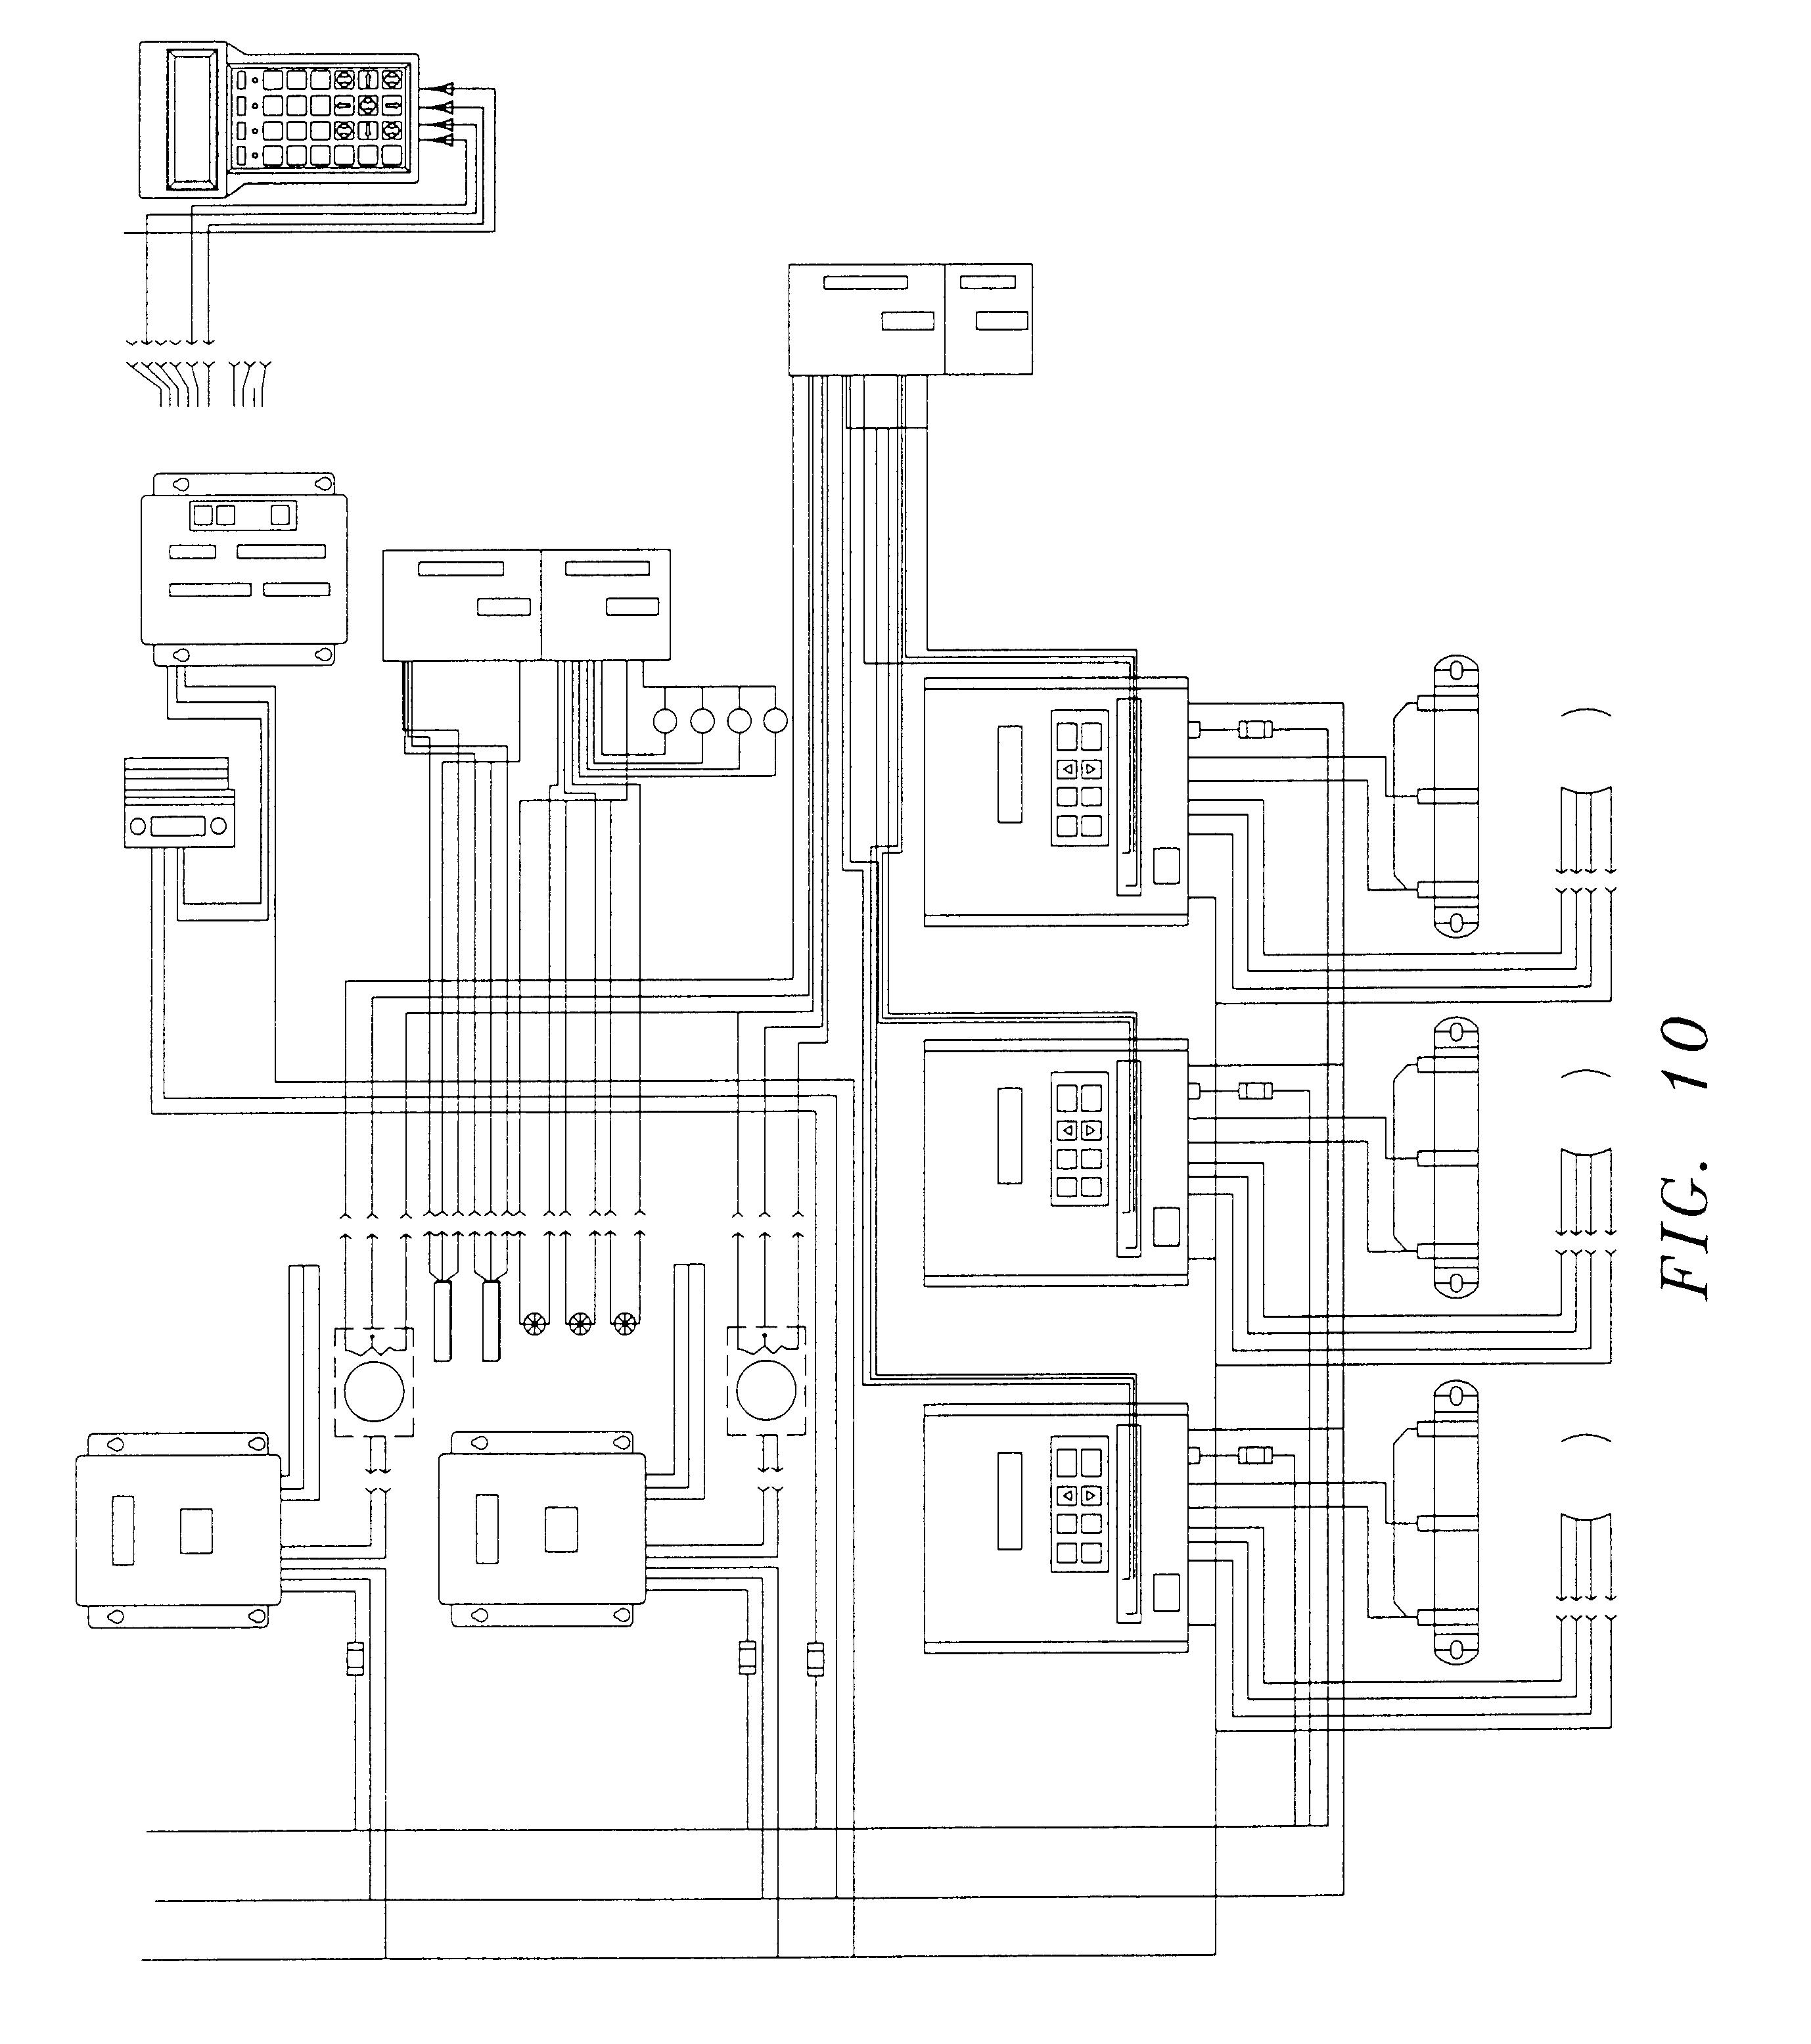 jugs pitching machine wiring diagram Download-Jugs Pitching Machine Wiring Diagram Jugs Pitching Machine Circuit Board Schematic Best Machine 2017 3-t